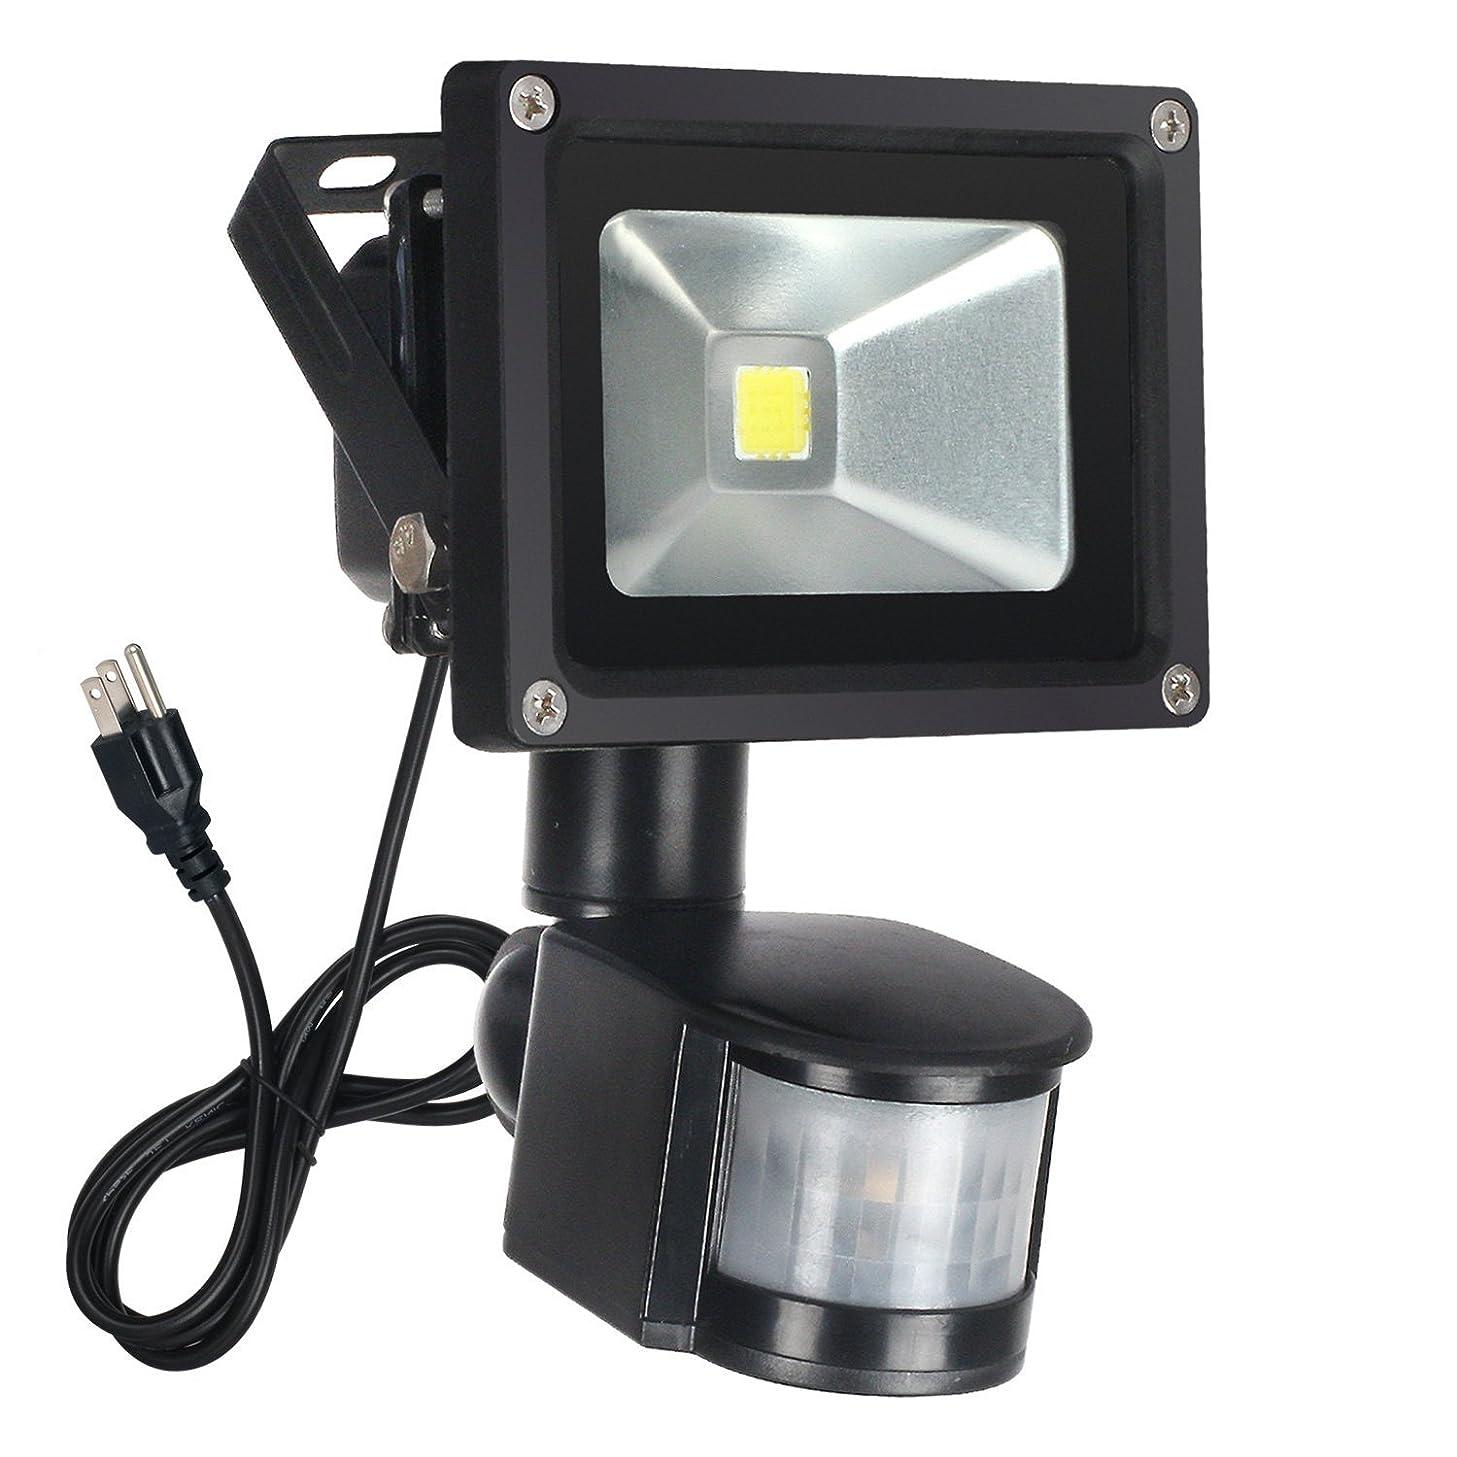 FAISHILAN Motion Sensor Flood Light 10W LED IP65 Waterproof Security Lights 6000K, 800 Lumen, US 3-Plug Outdoor Wall Light